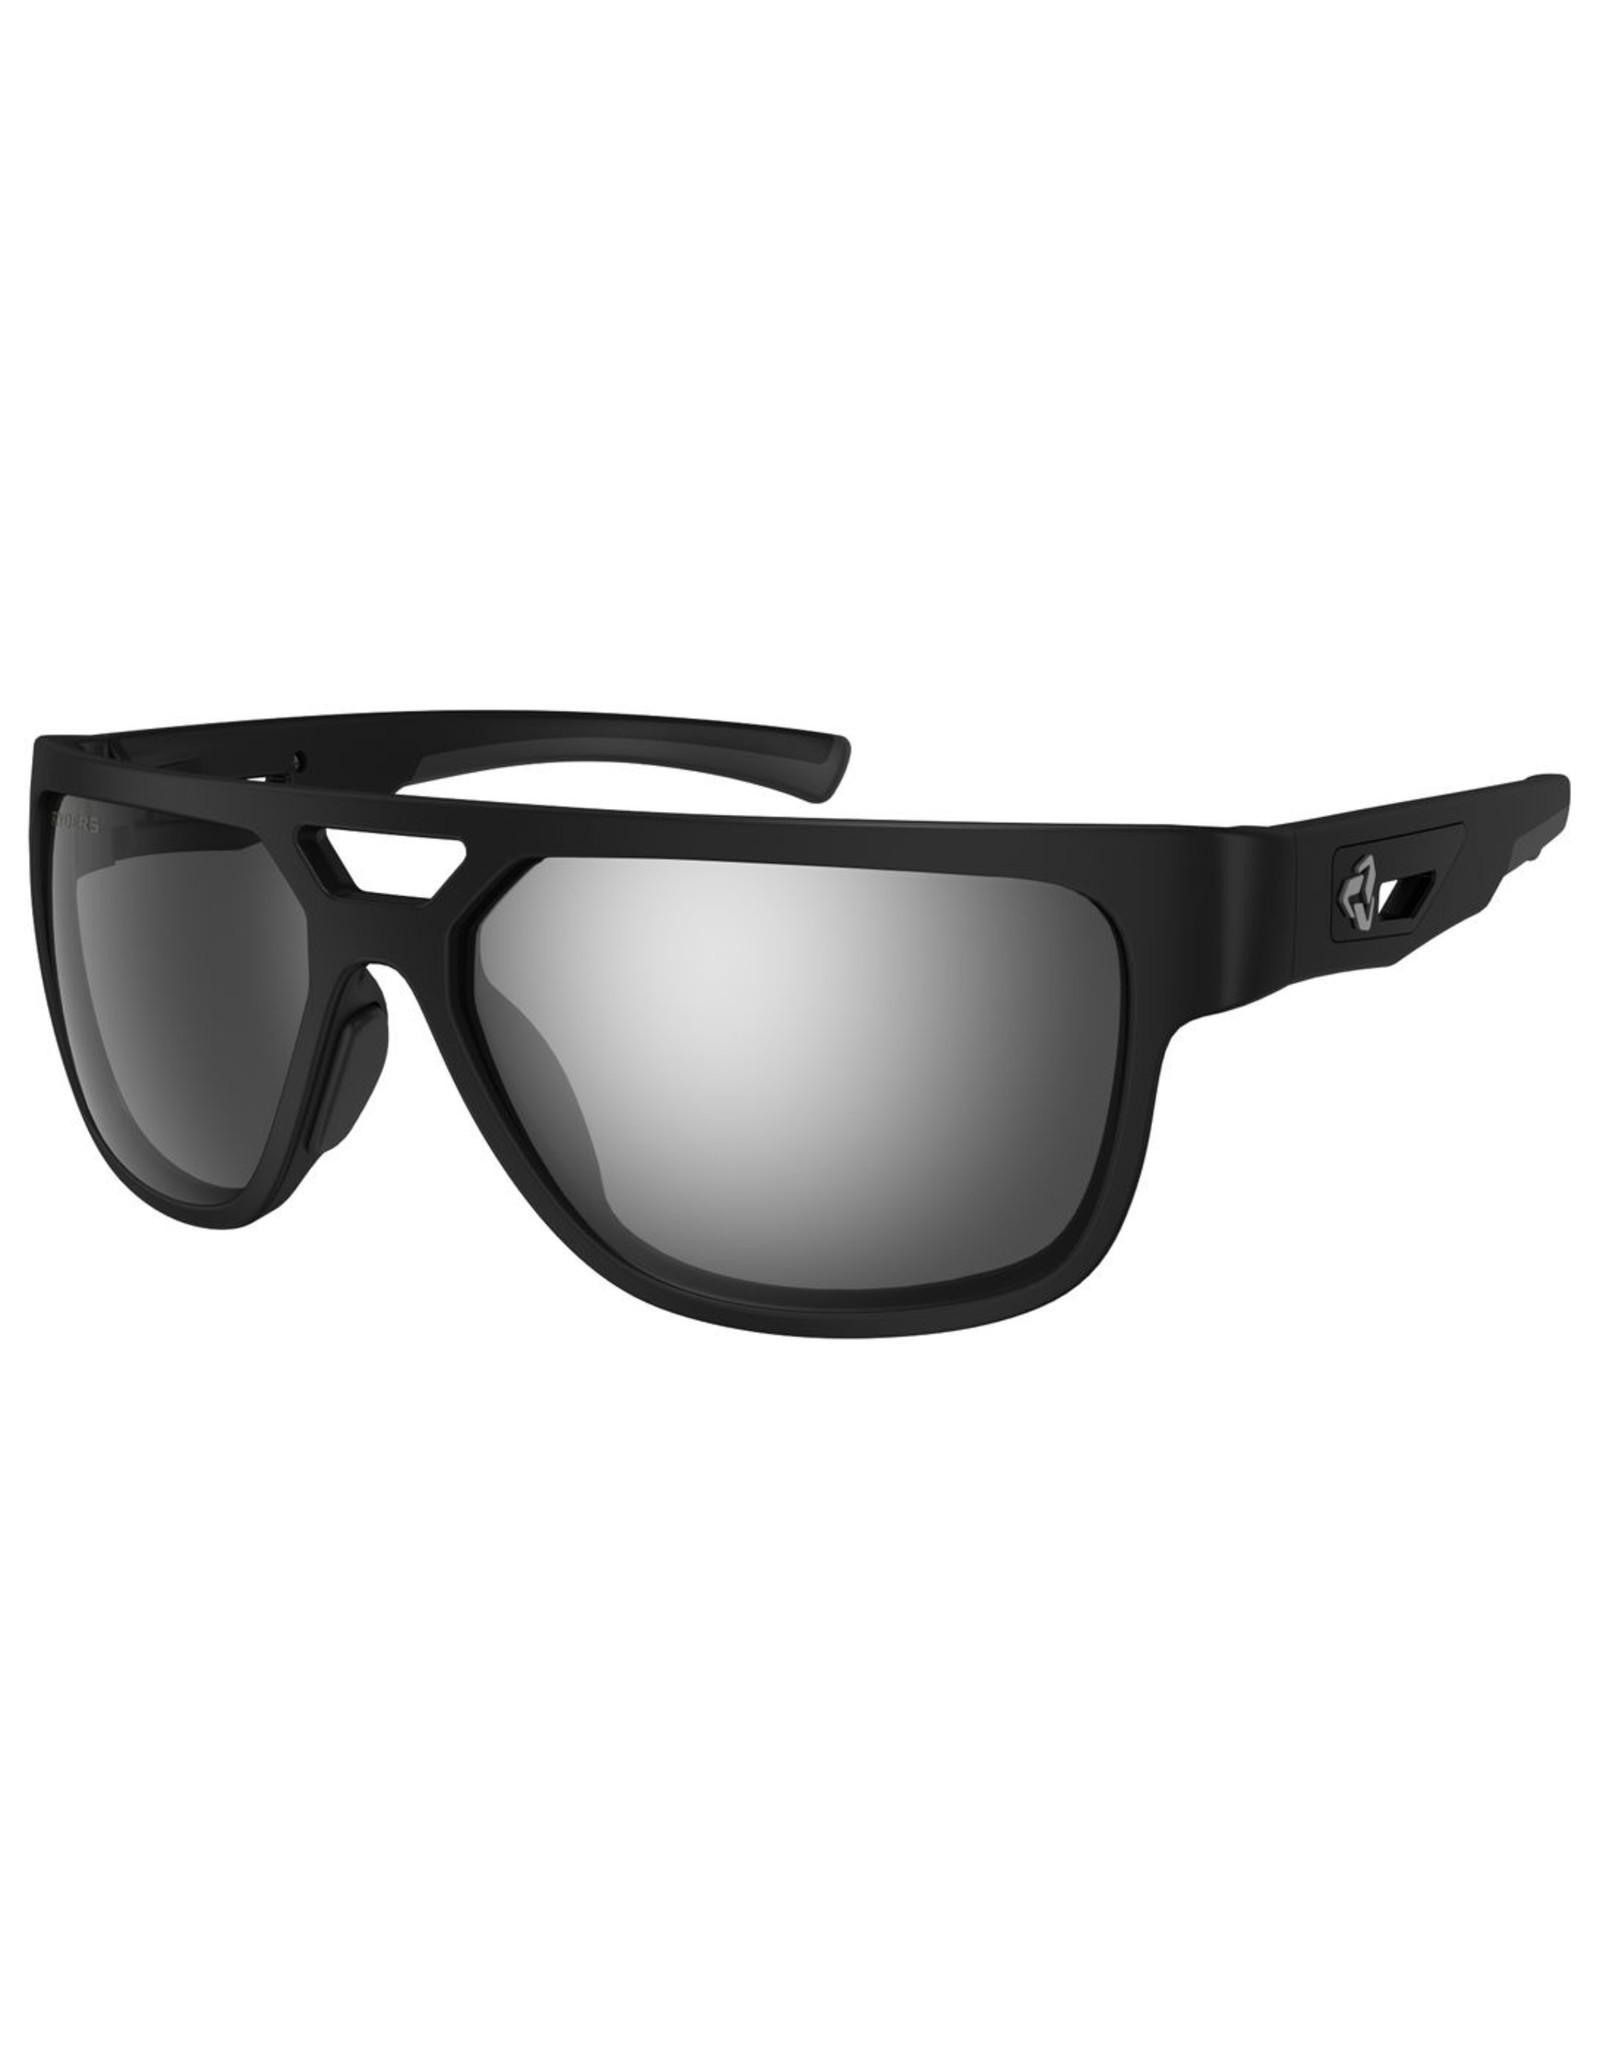 Ryders Eyewear - Cakewalk CB Black/Green Lens AR